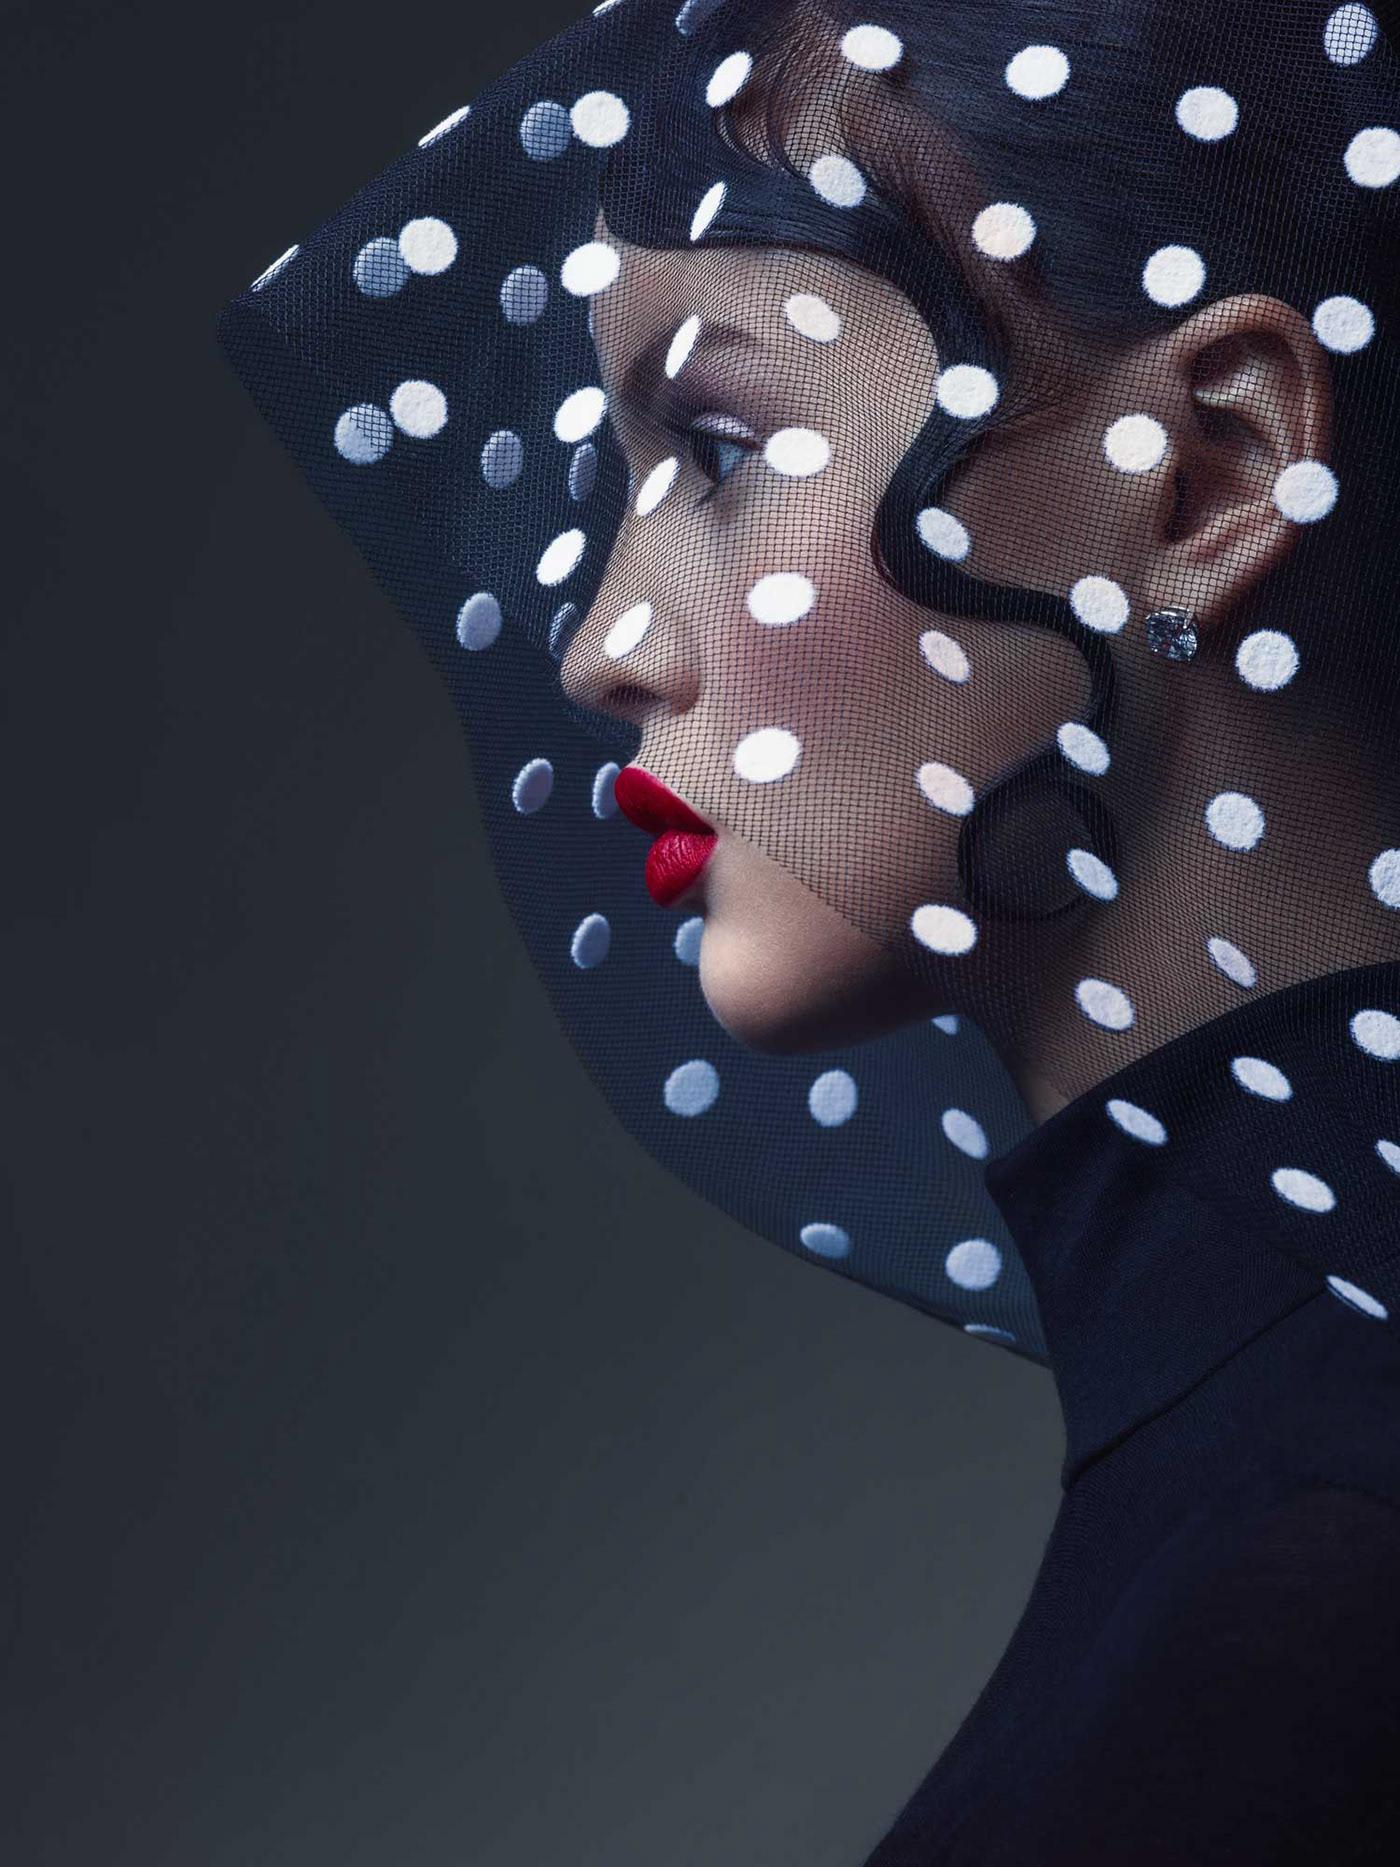 Bianca Lace / Photographer Lee Walls